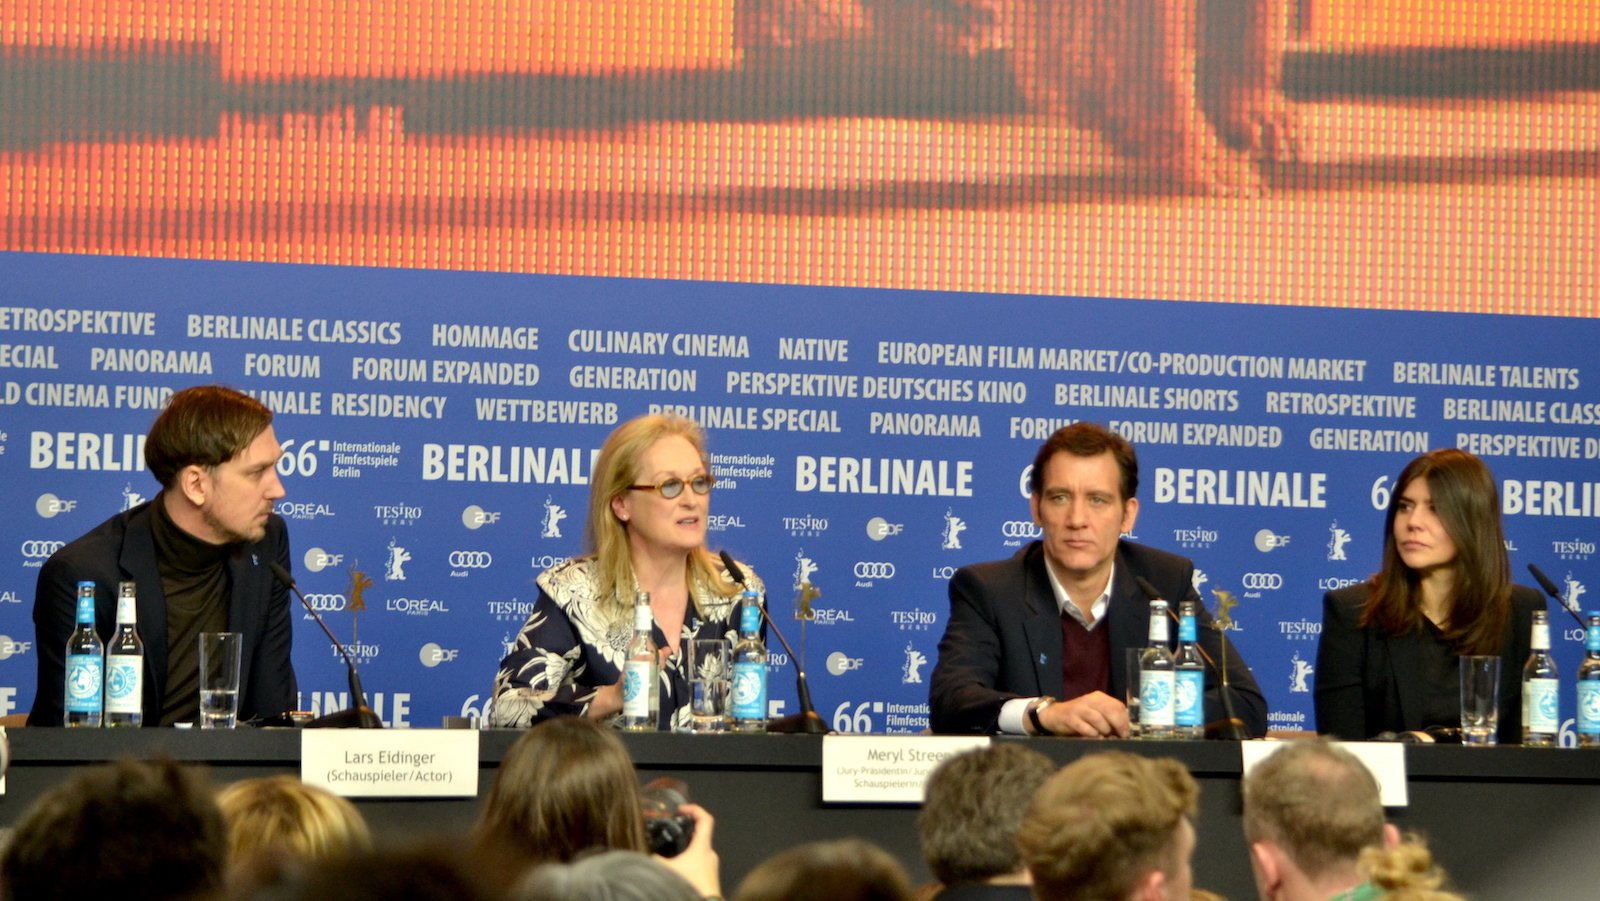 Berlino 2016: Meryl Streep, Clive Owen, Lars Eidinger e Małgorzata Szumowska in conferenza stampa